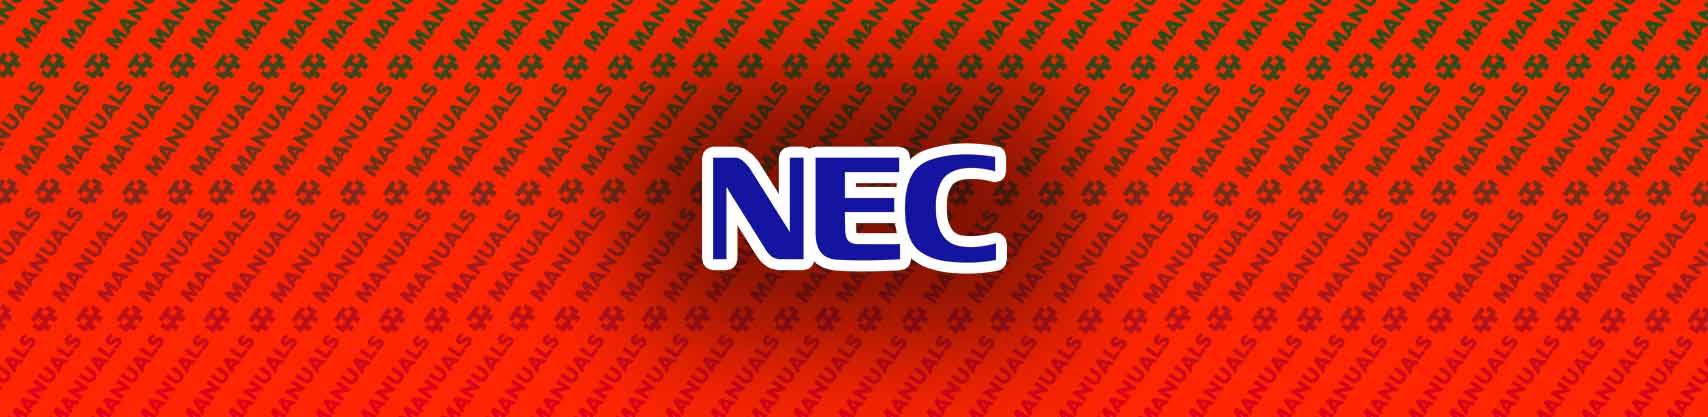 NEC DT400 Manual